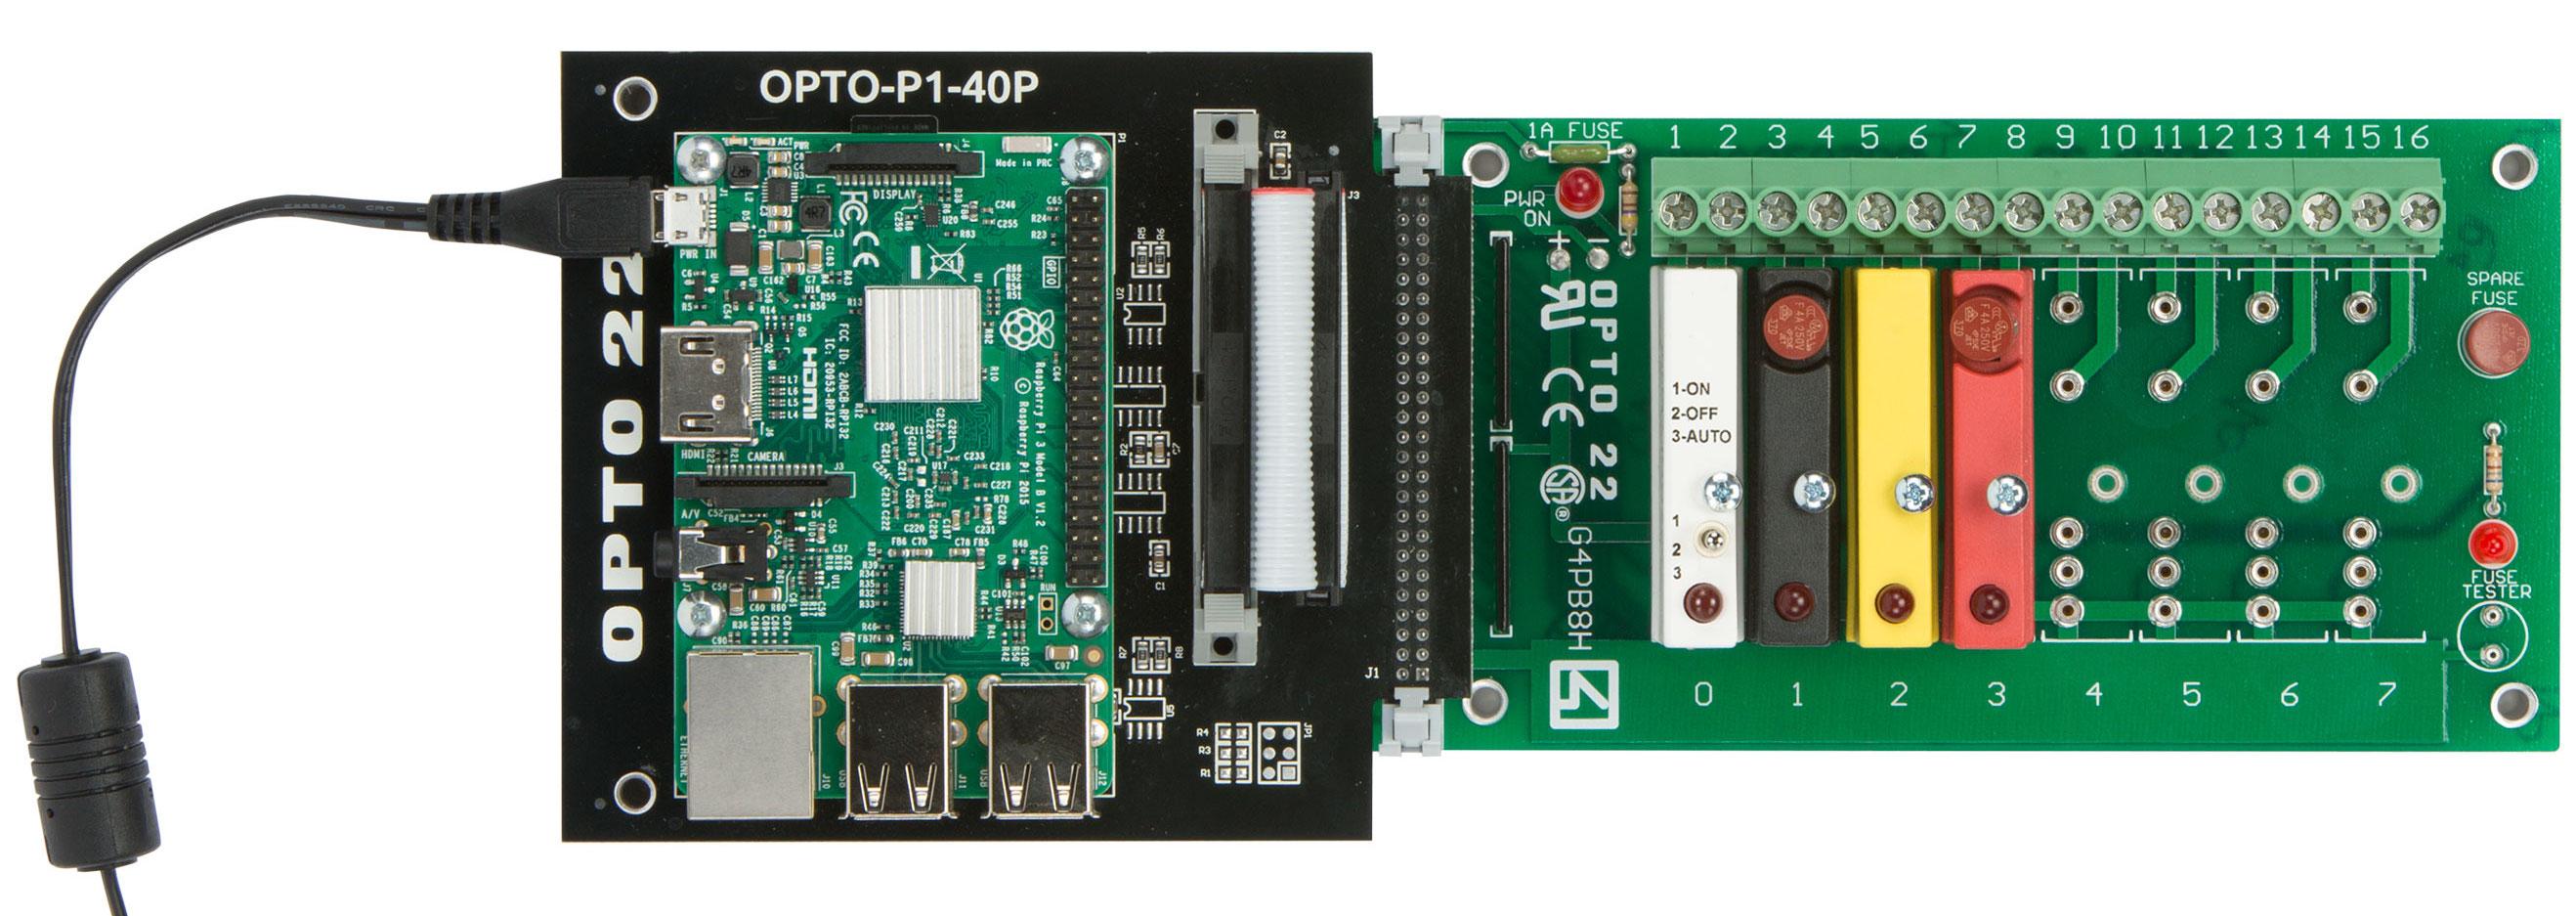 Opto 22 industrial digital I/O for Raspberry Pi